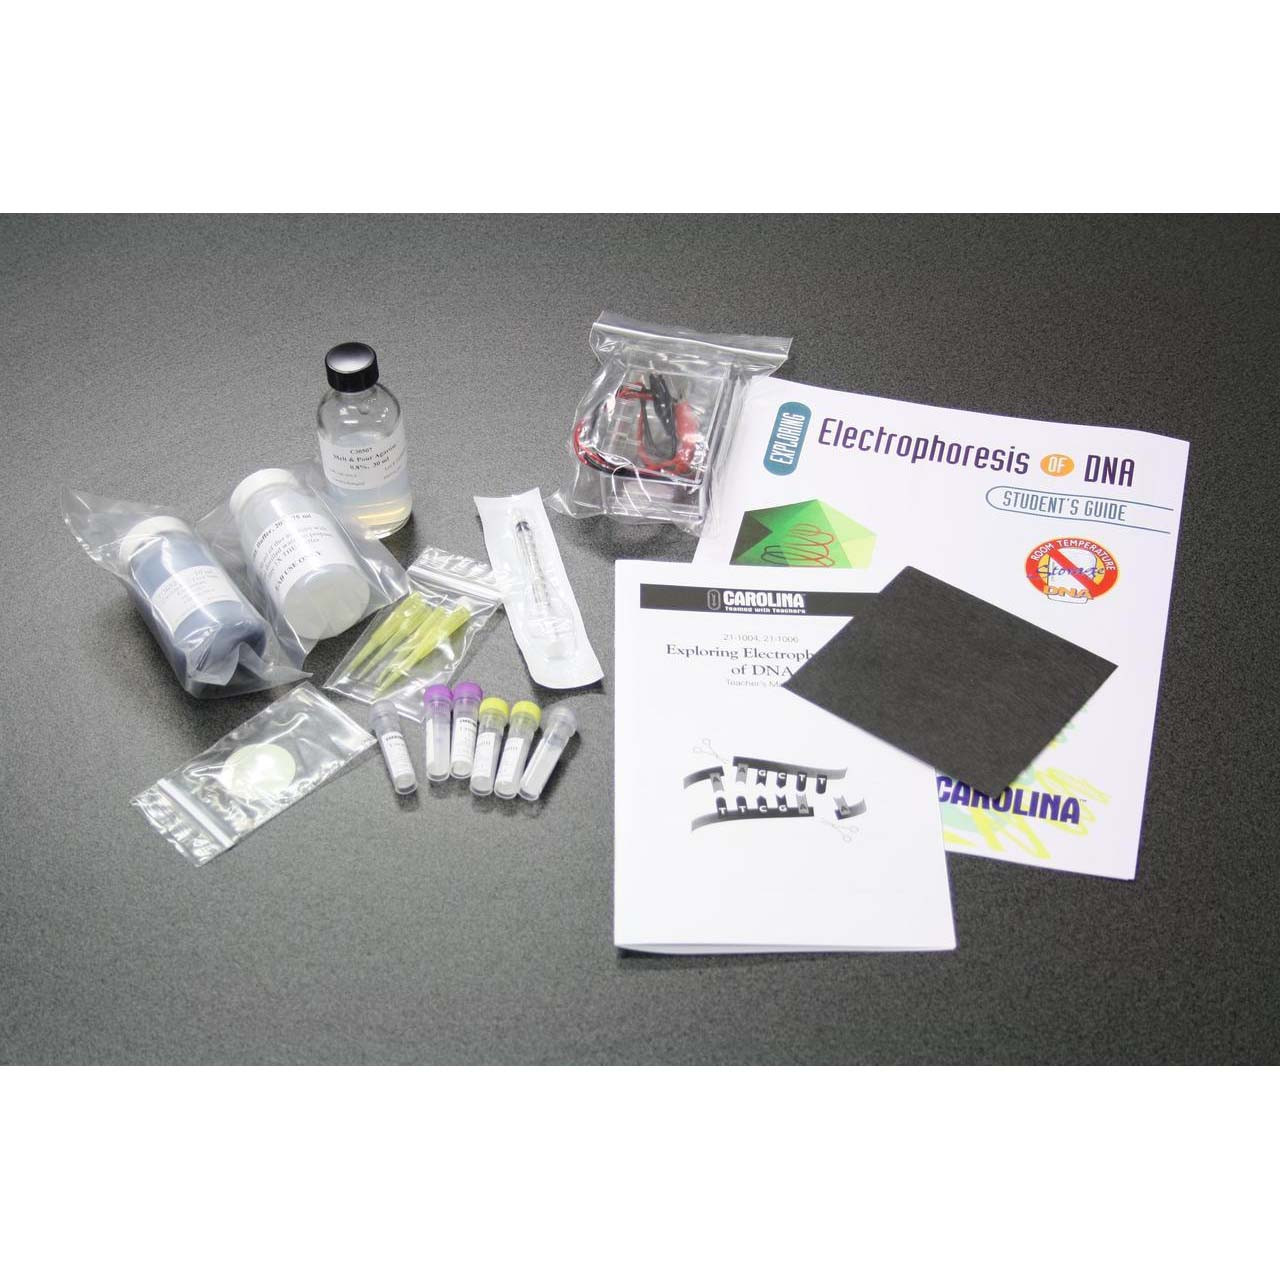 Exploring Electrophoresis of DNA, classroom kit